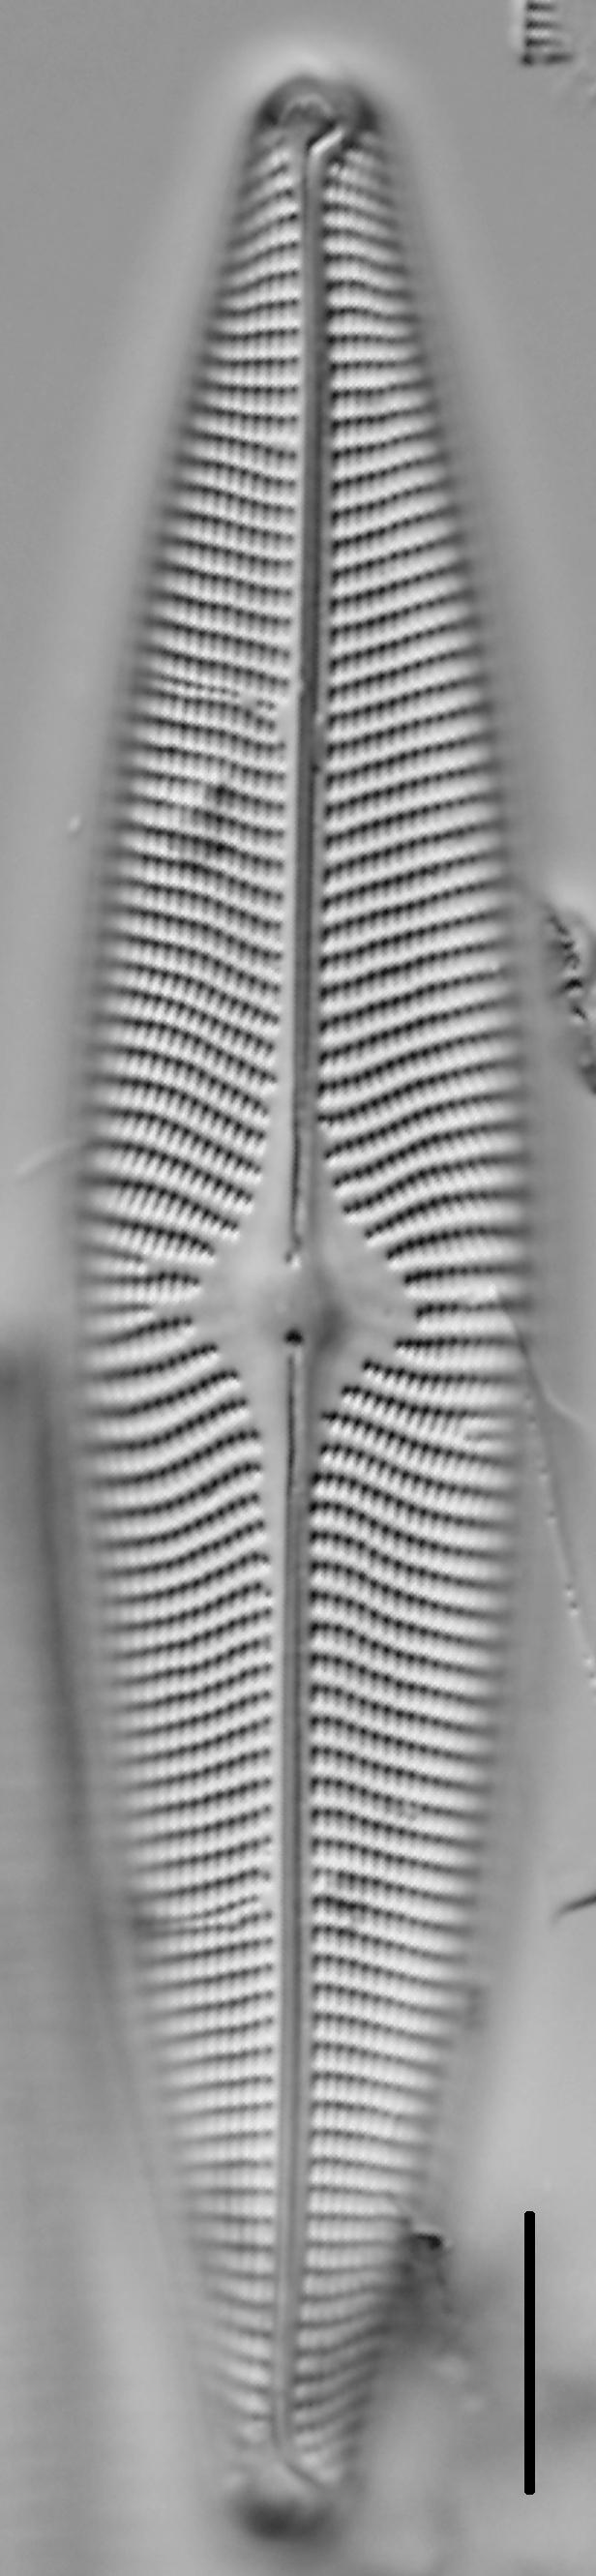 Navicula vulpina LM5